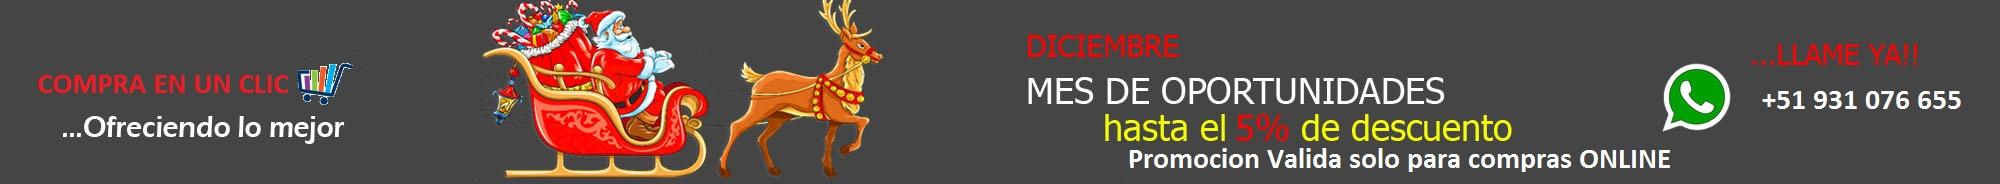 100A 80A-300A Interruptor autom/ático con restablecimiento autom/ático Fusible de restablecimiento autom/ático Bot/ón de restablecimiento manual Interruptor autom/ático autom/ático Suuonee